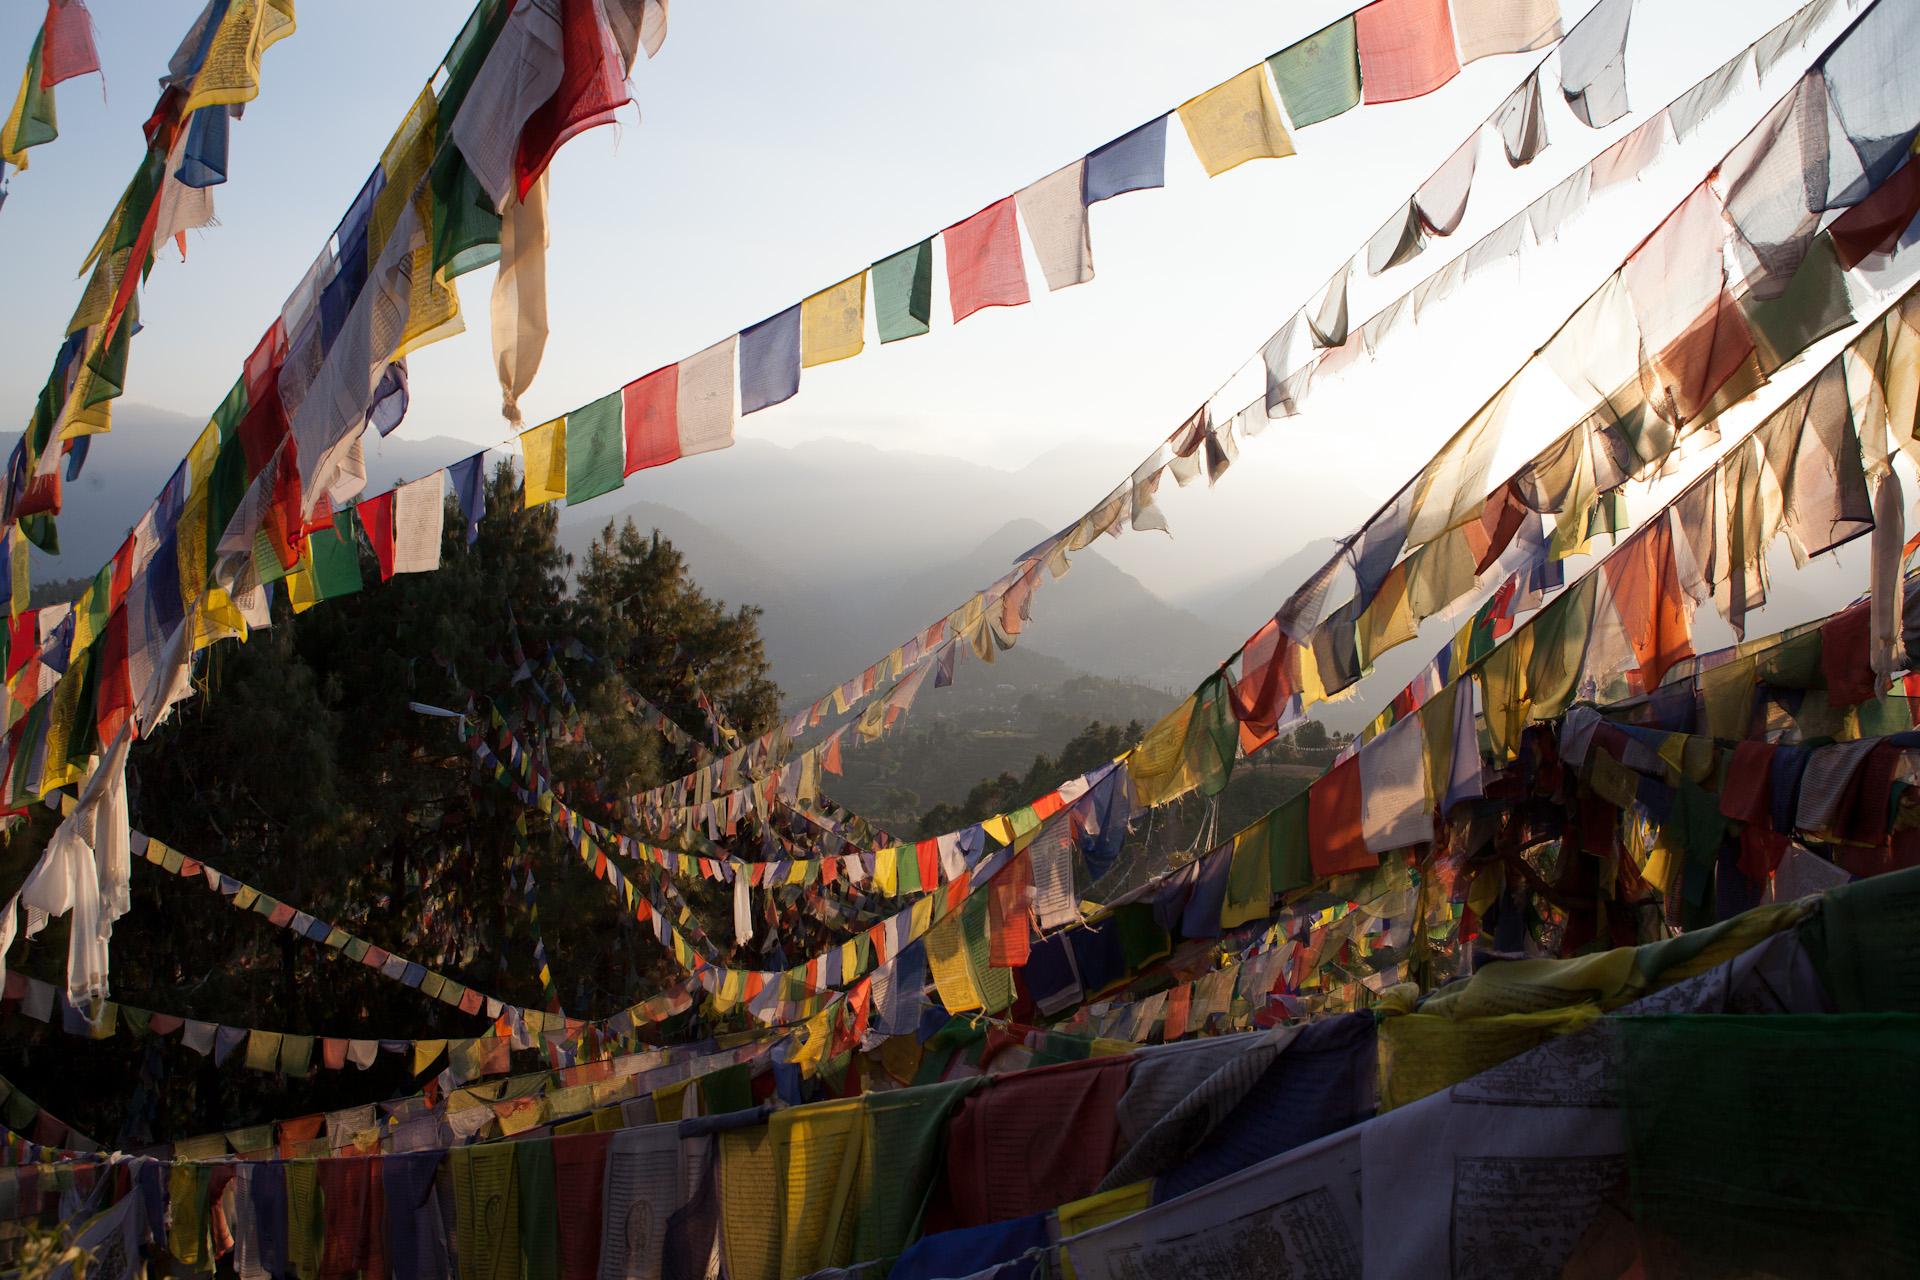 Humanitarian-Prayer-Flags-Mindful-Medicine-Nepal-Namo-buddha-10.JPG